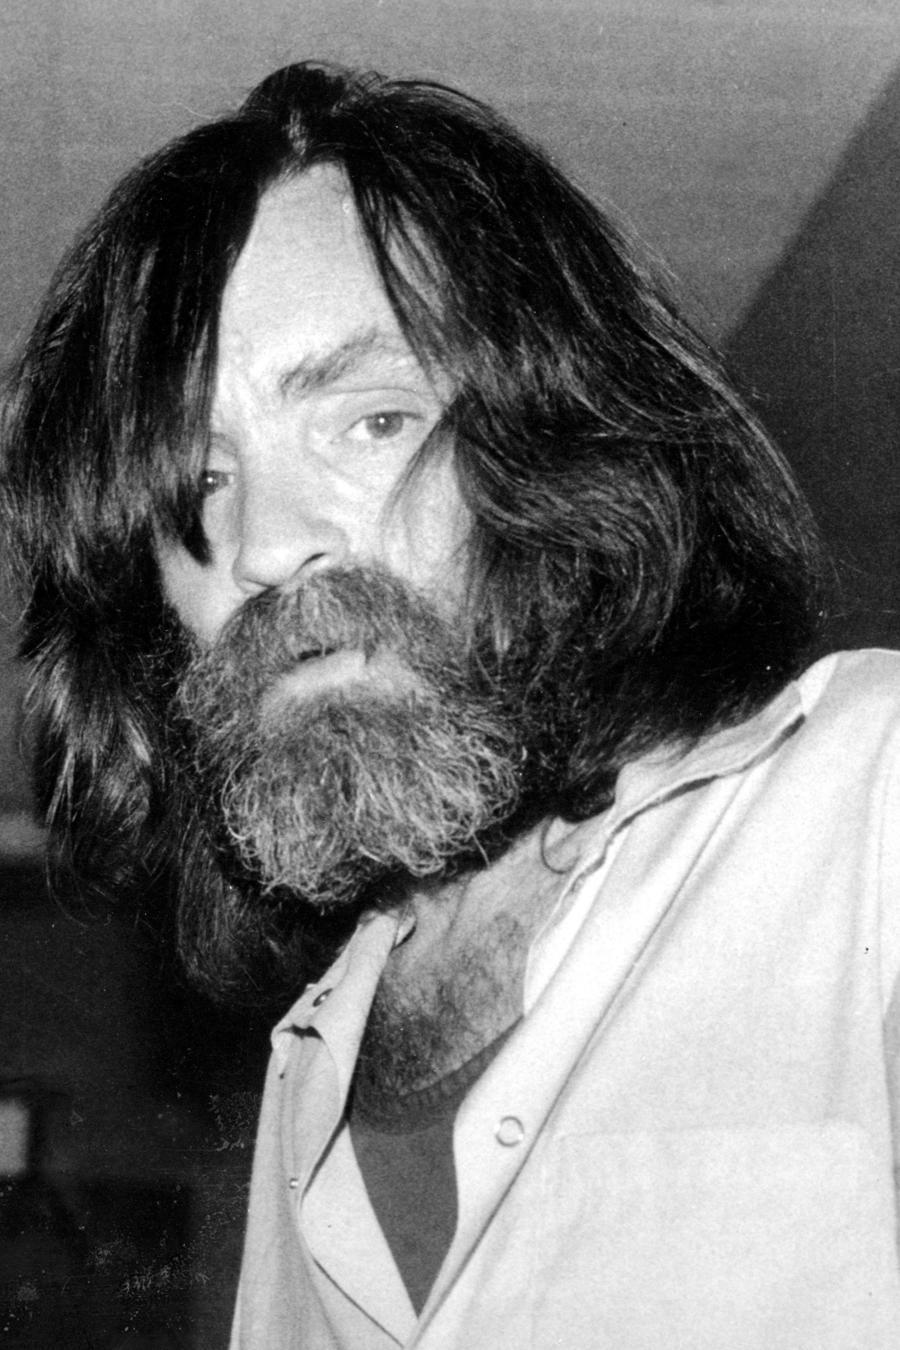 Imagen de archivo del asesino en serie, Charles Manson, en 1981.